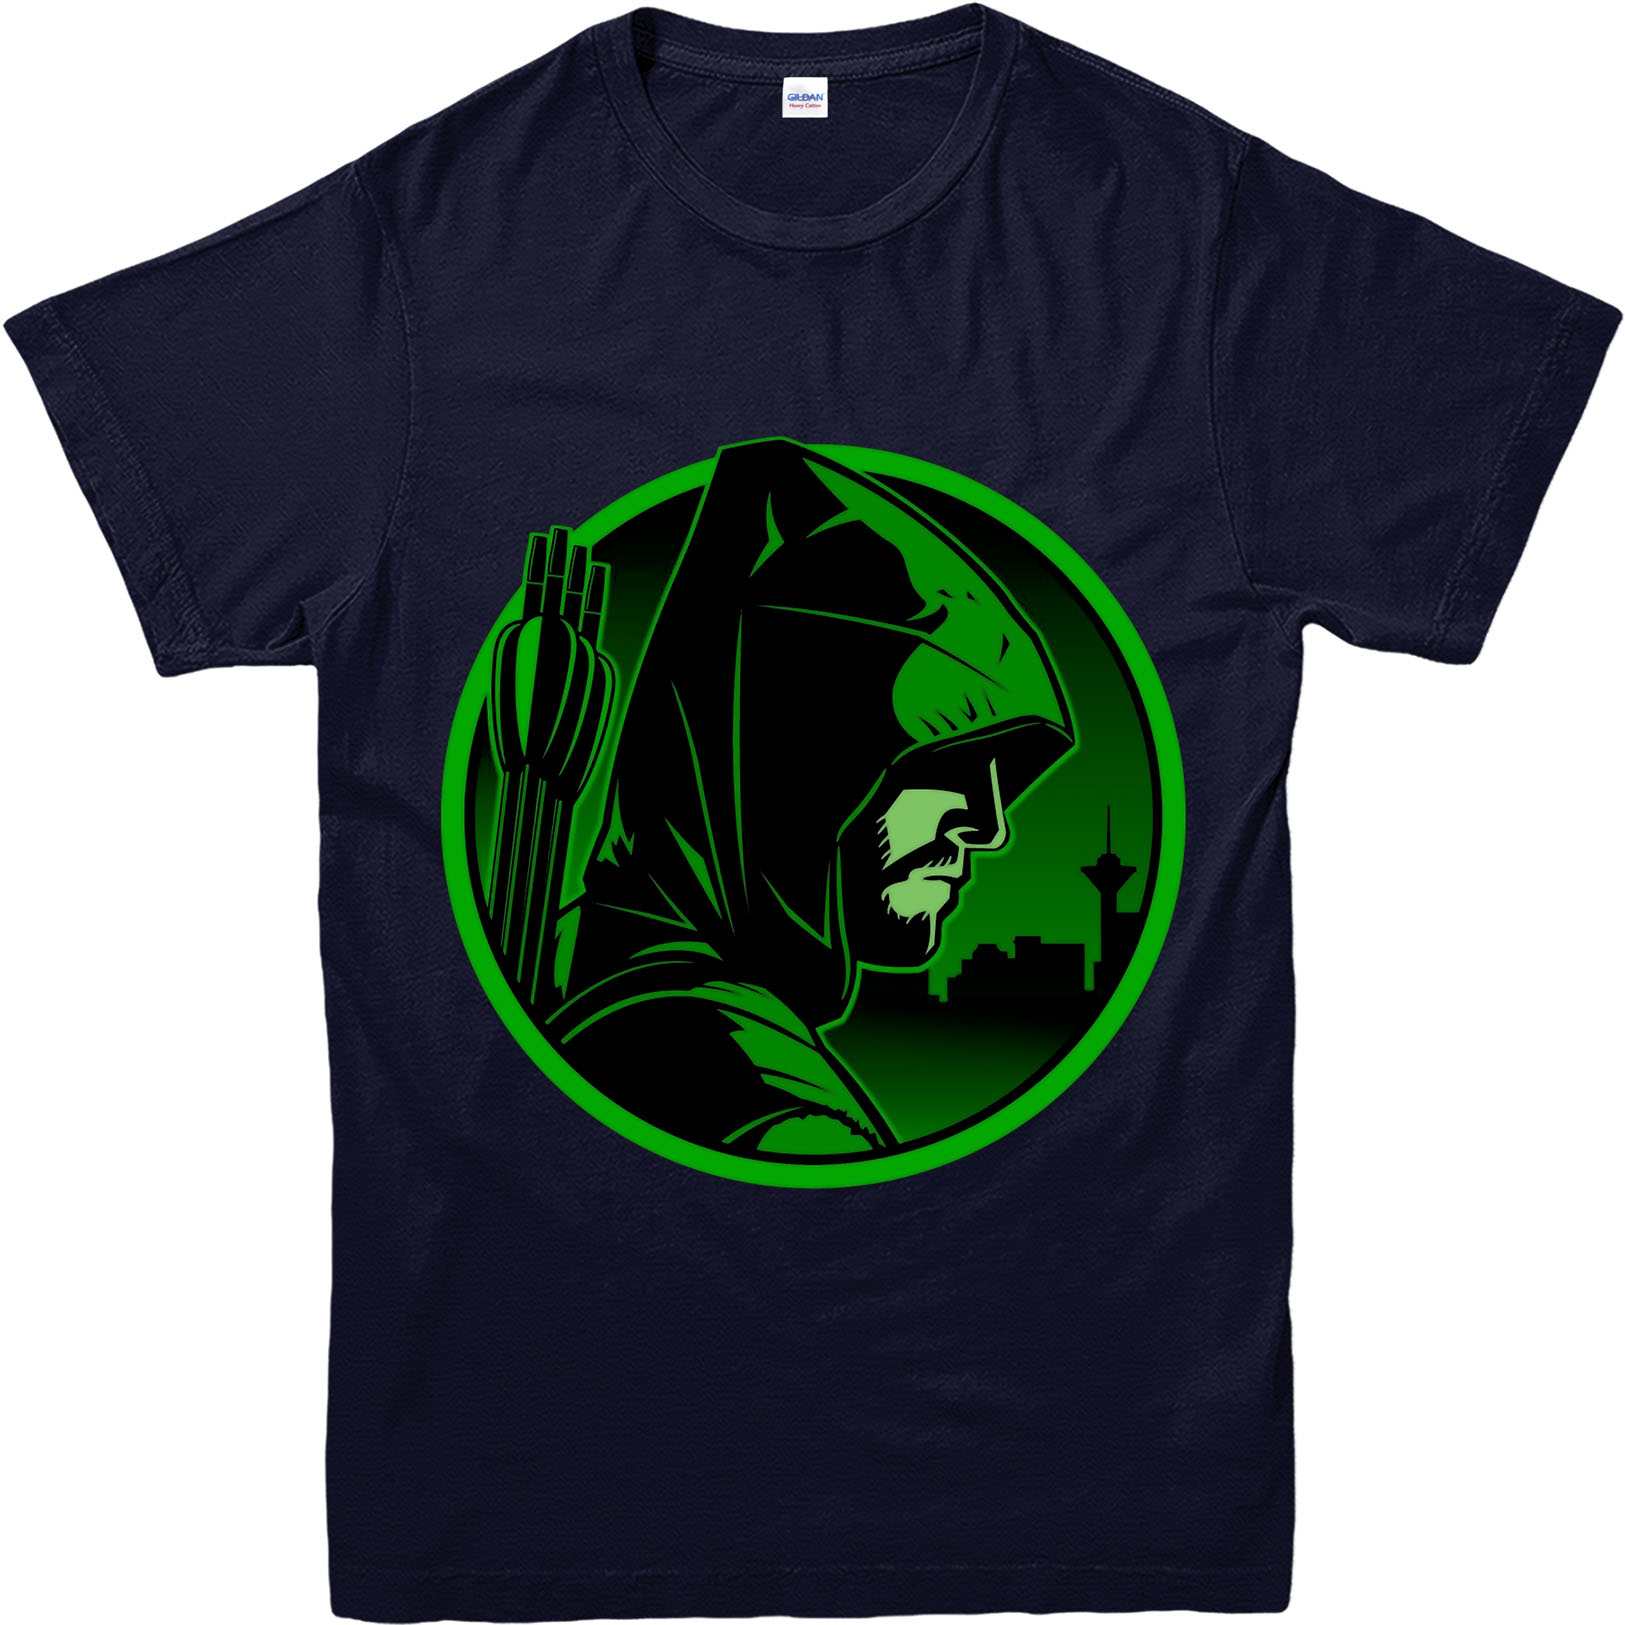 Arrow t shirt dc comics green arrow inspired design top for Dc t shirt design